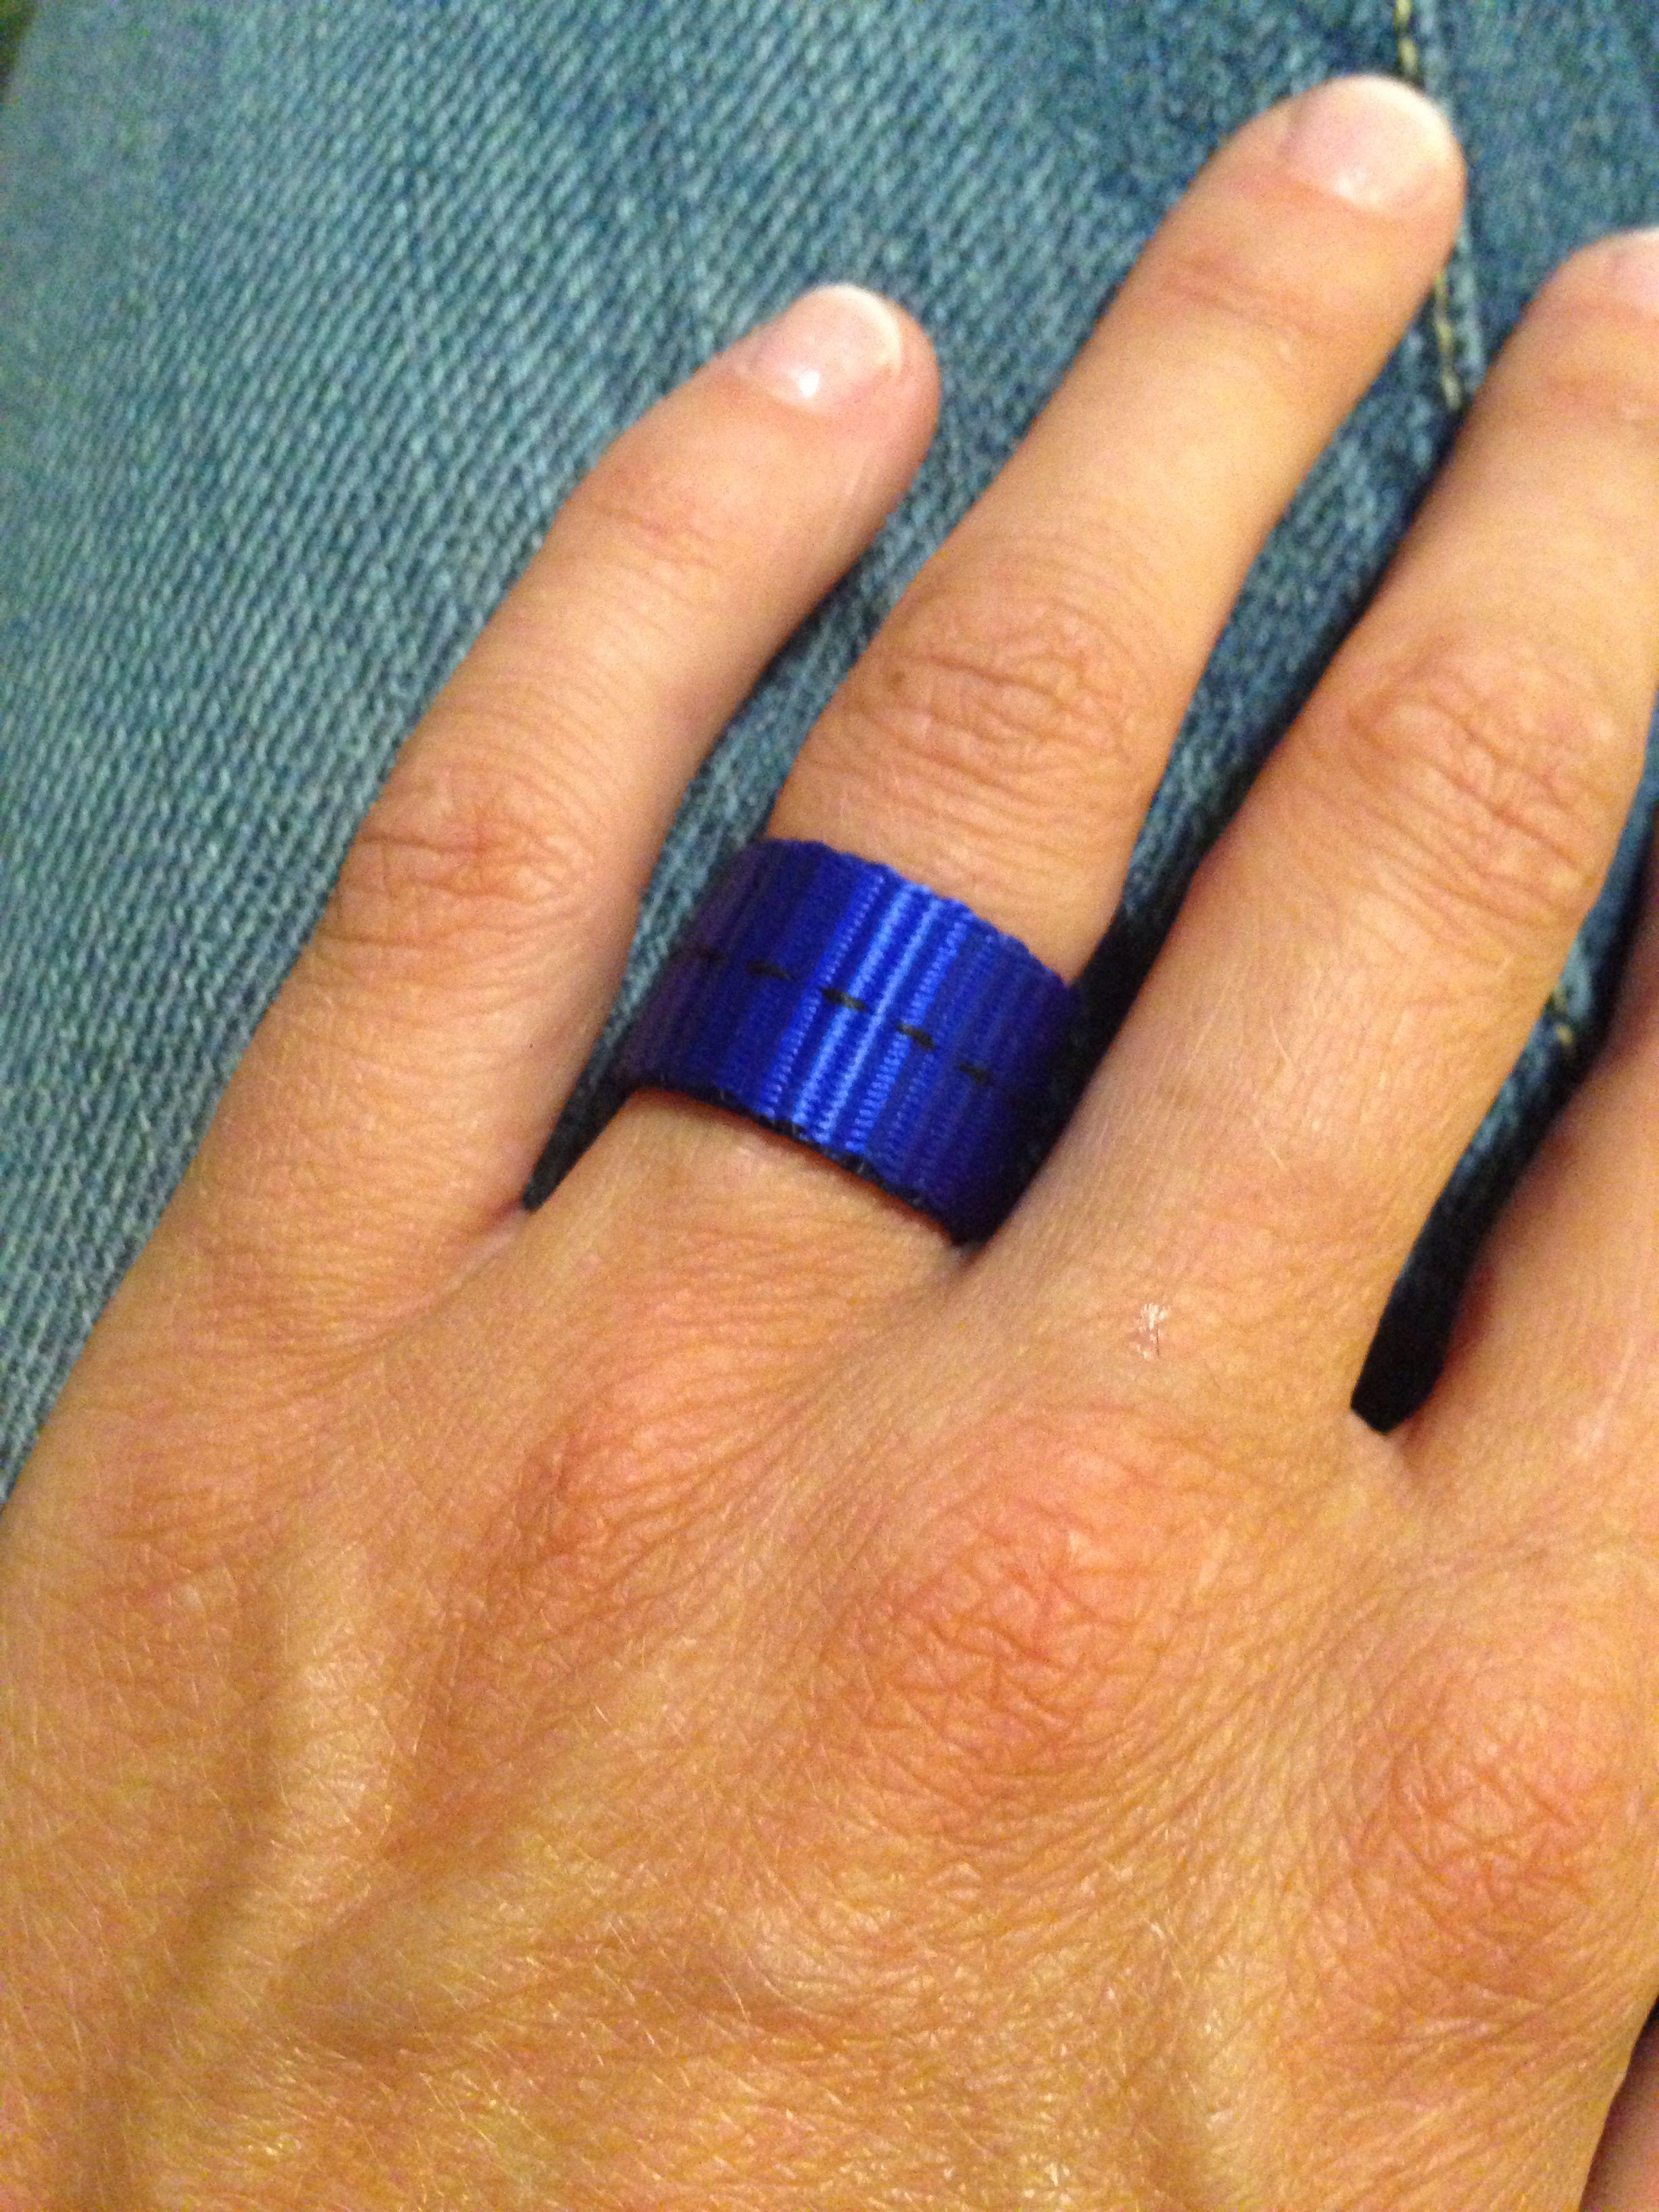 Rock Climber Wedding Ring: Rock Climber Wedding Band At Websimilar.org